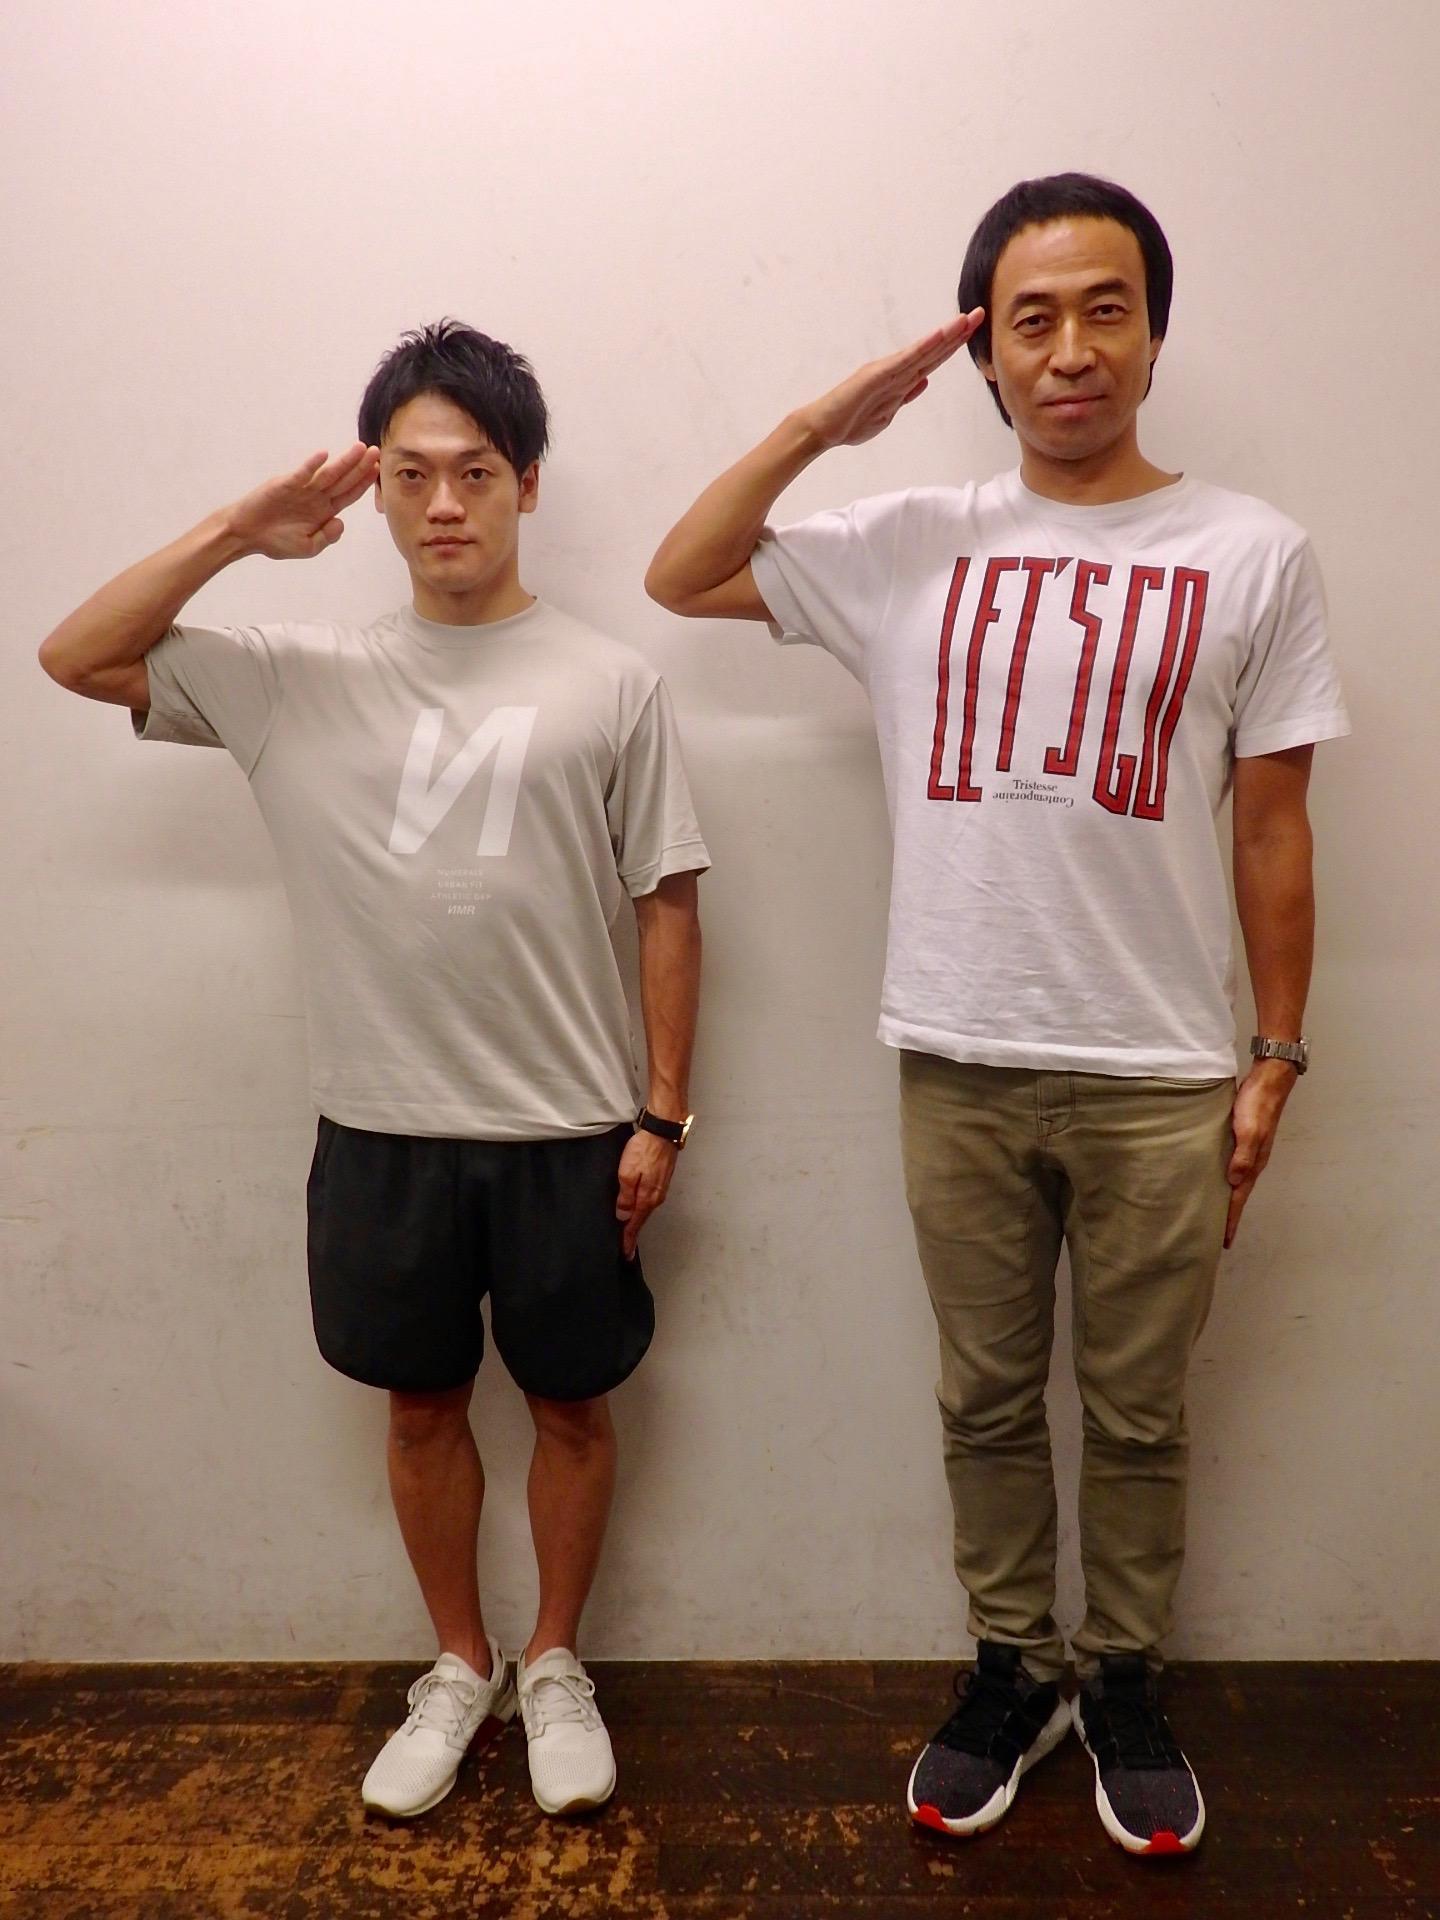 http://news.yoshimoto.co.jp/20180910044824-6cfa32d2a73a6f1eb53cf437c2d43491c861dbd1.jpg